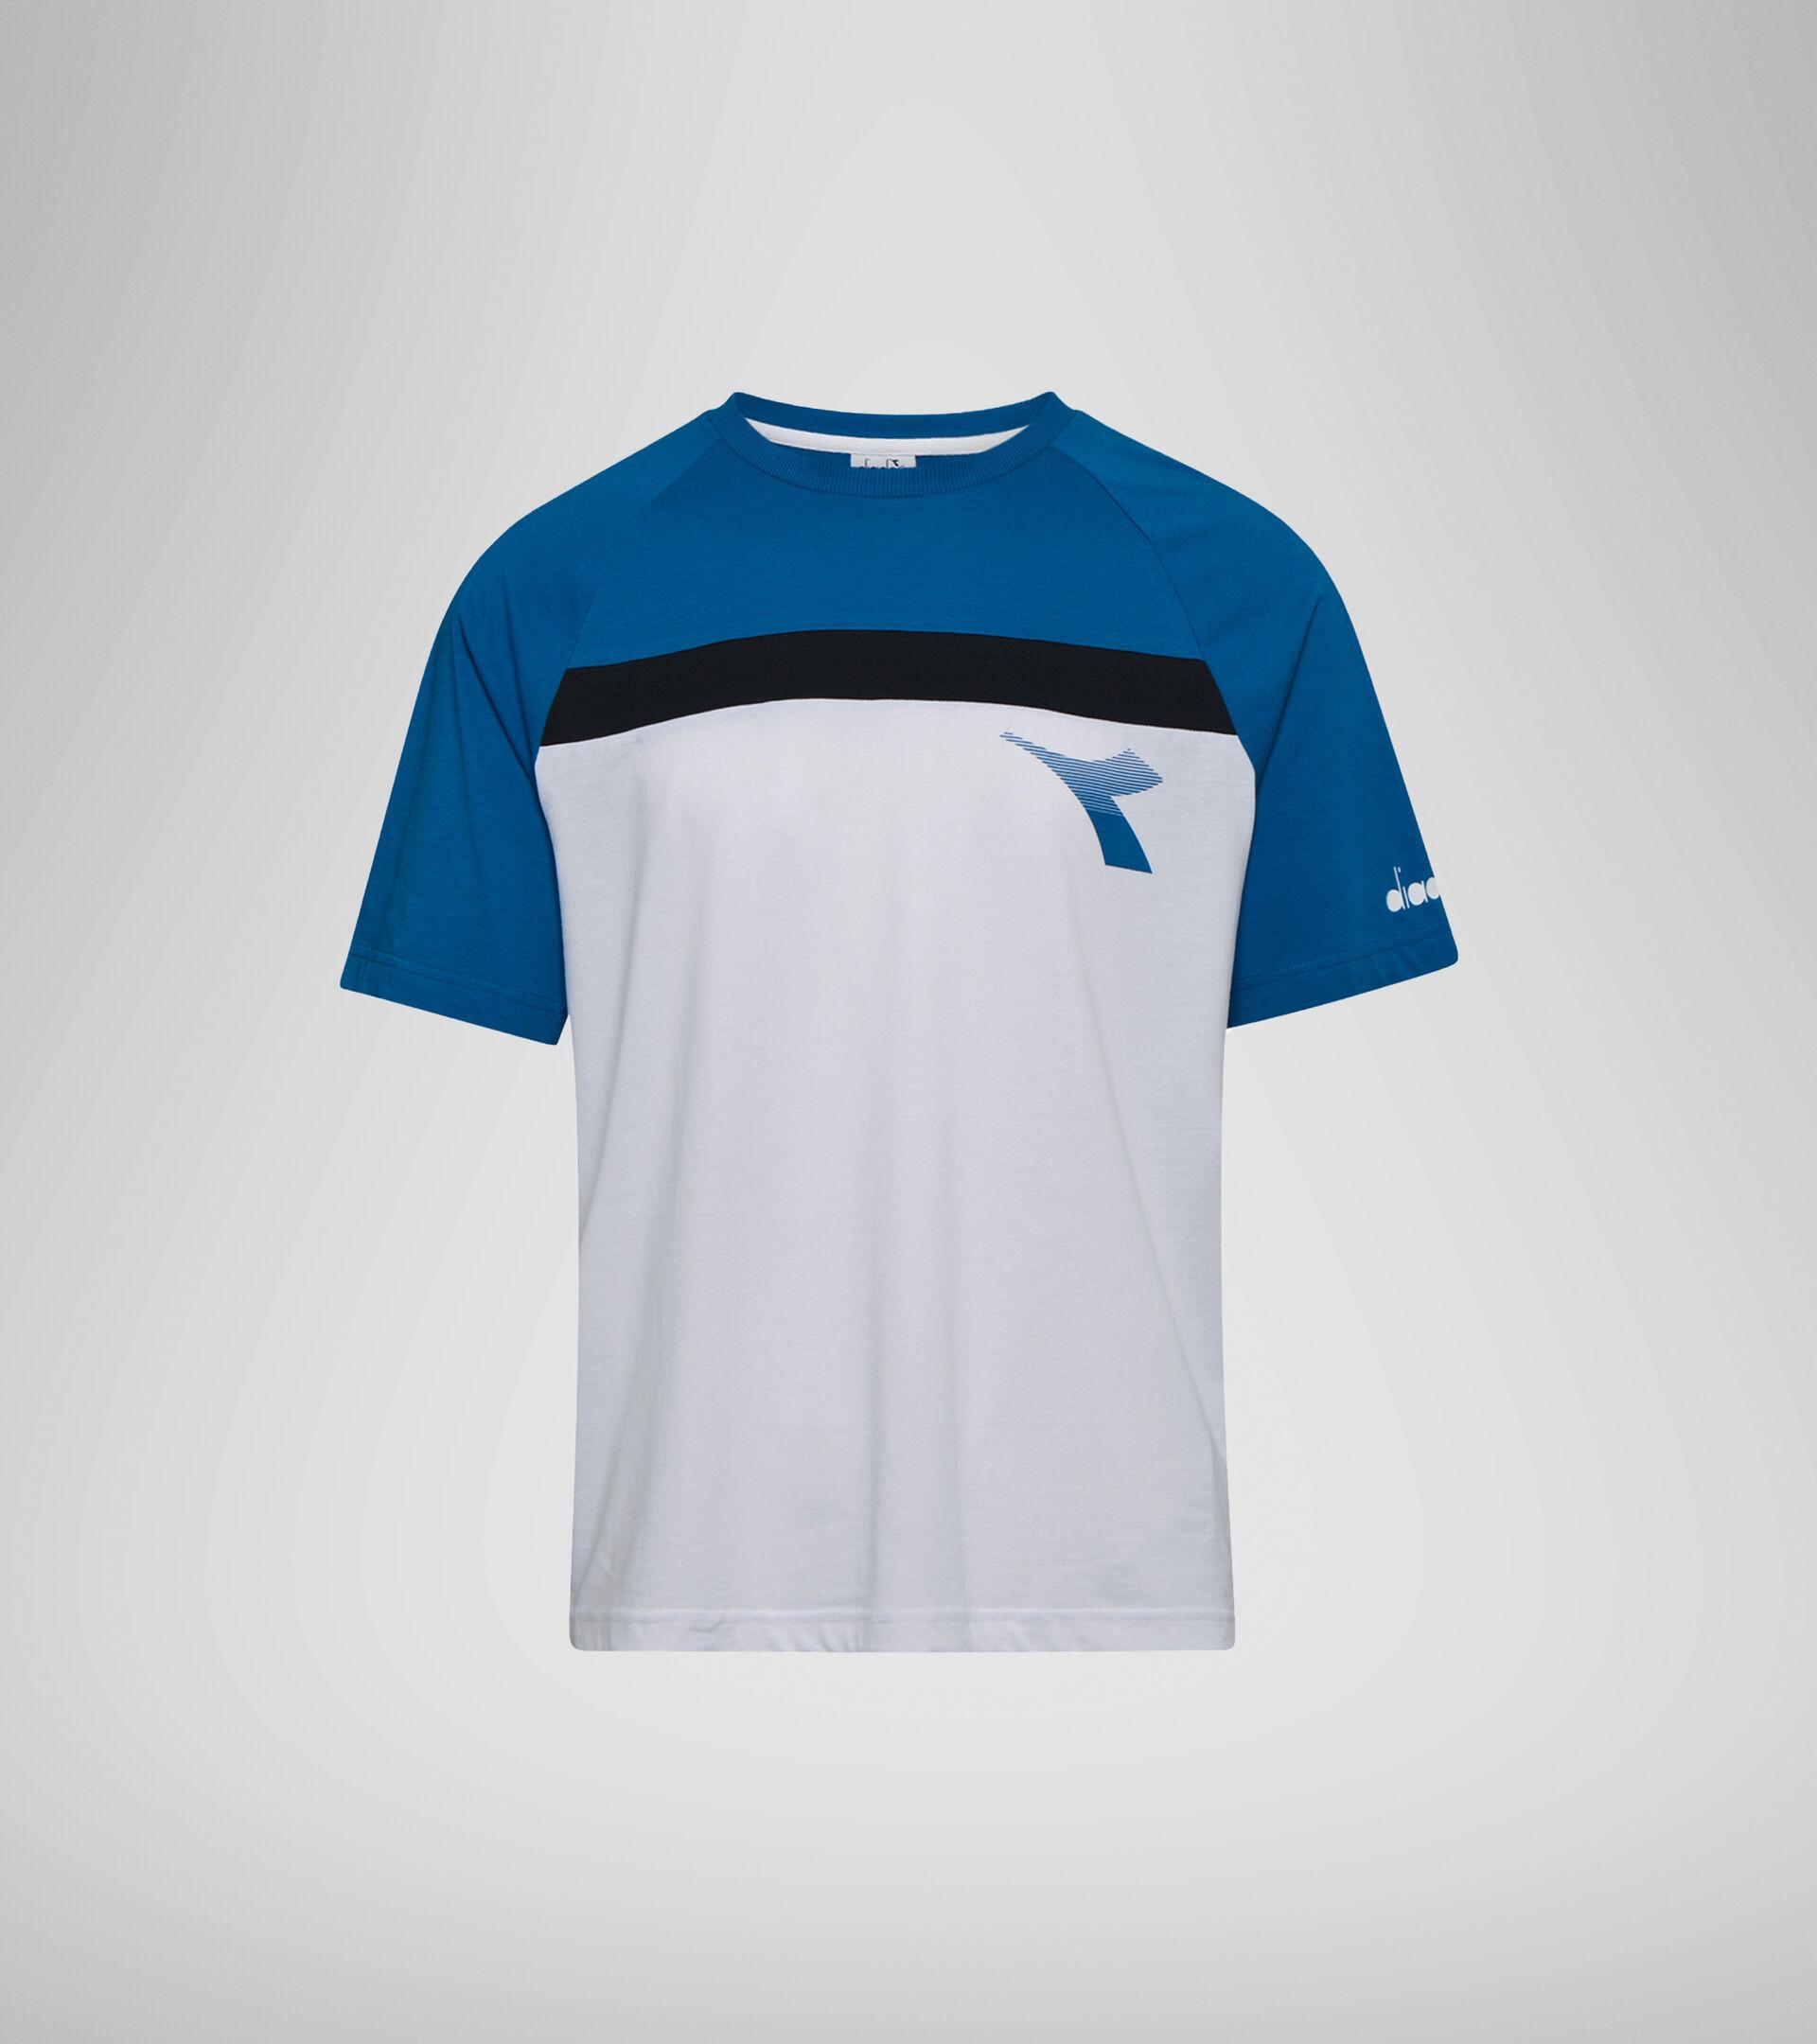 T-shirt - Men T-SHIRT SS DIADORA CLUB OPTICAL WHITE - Diadora